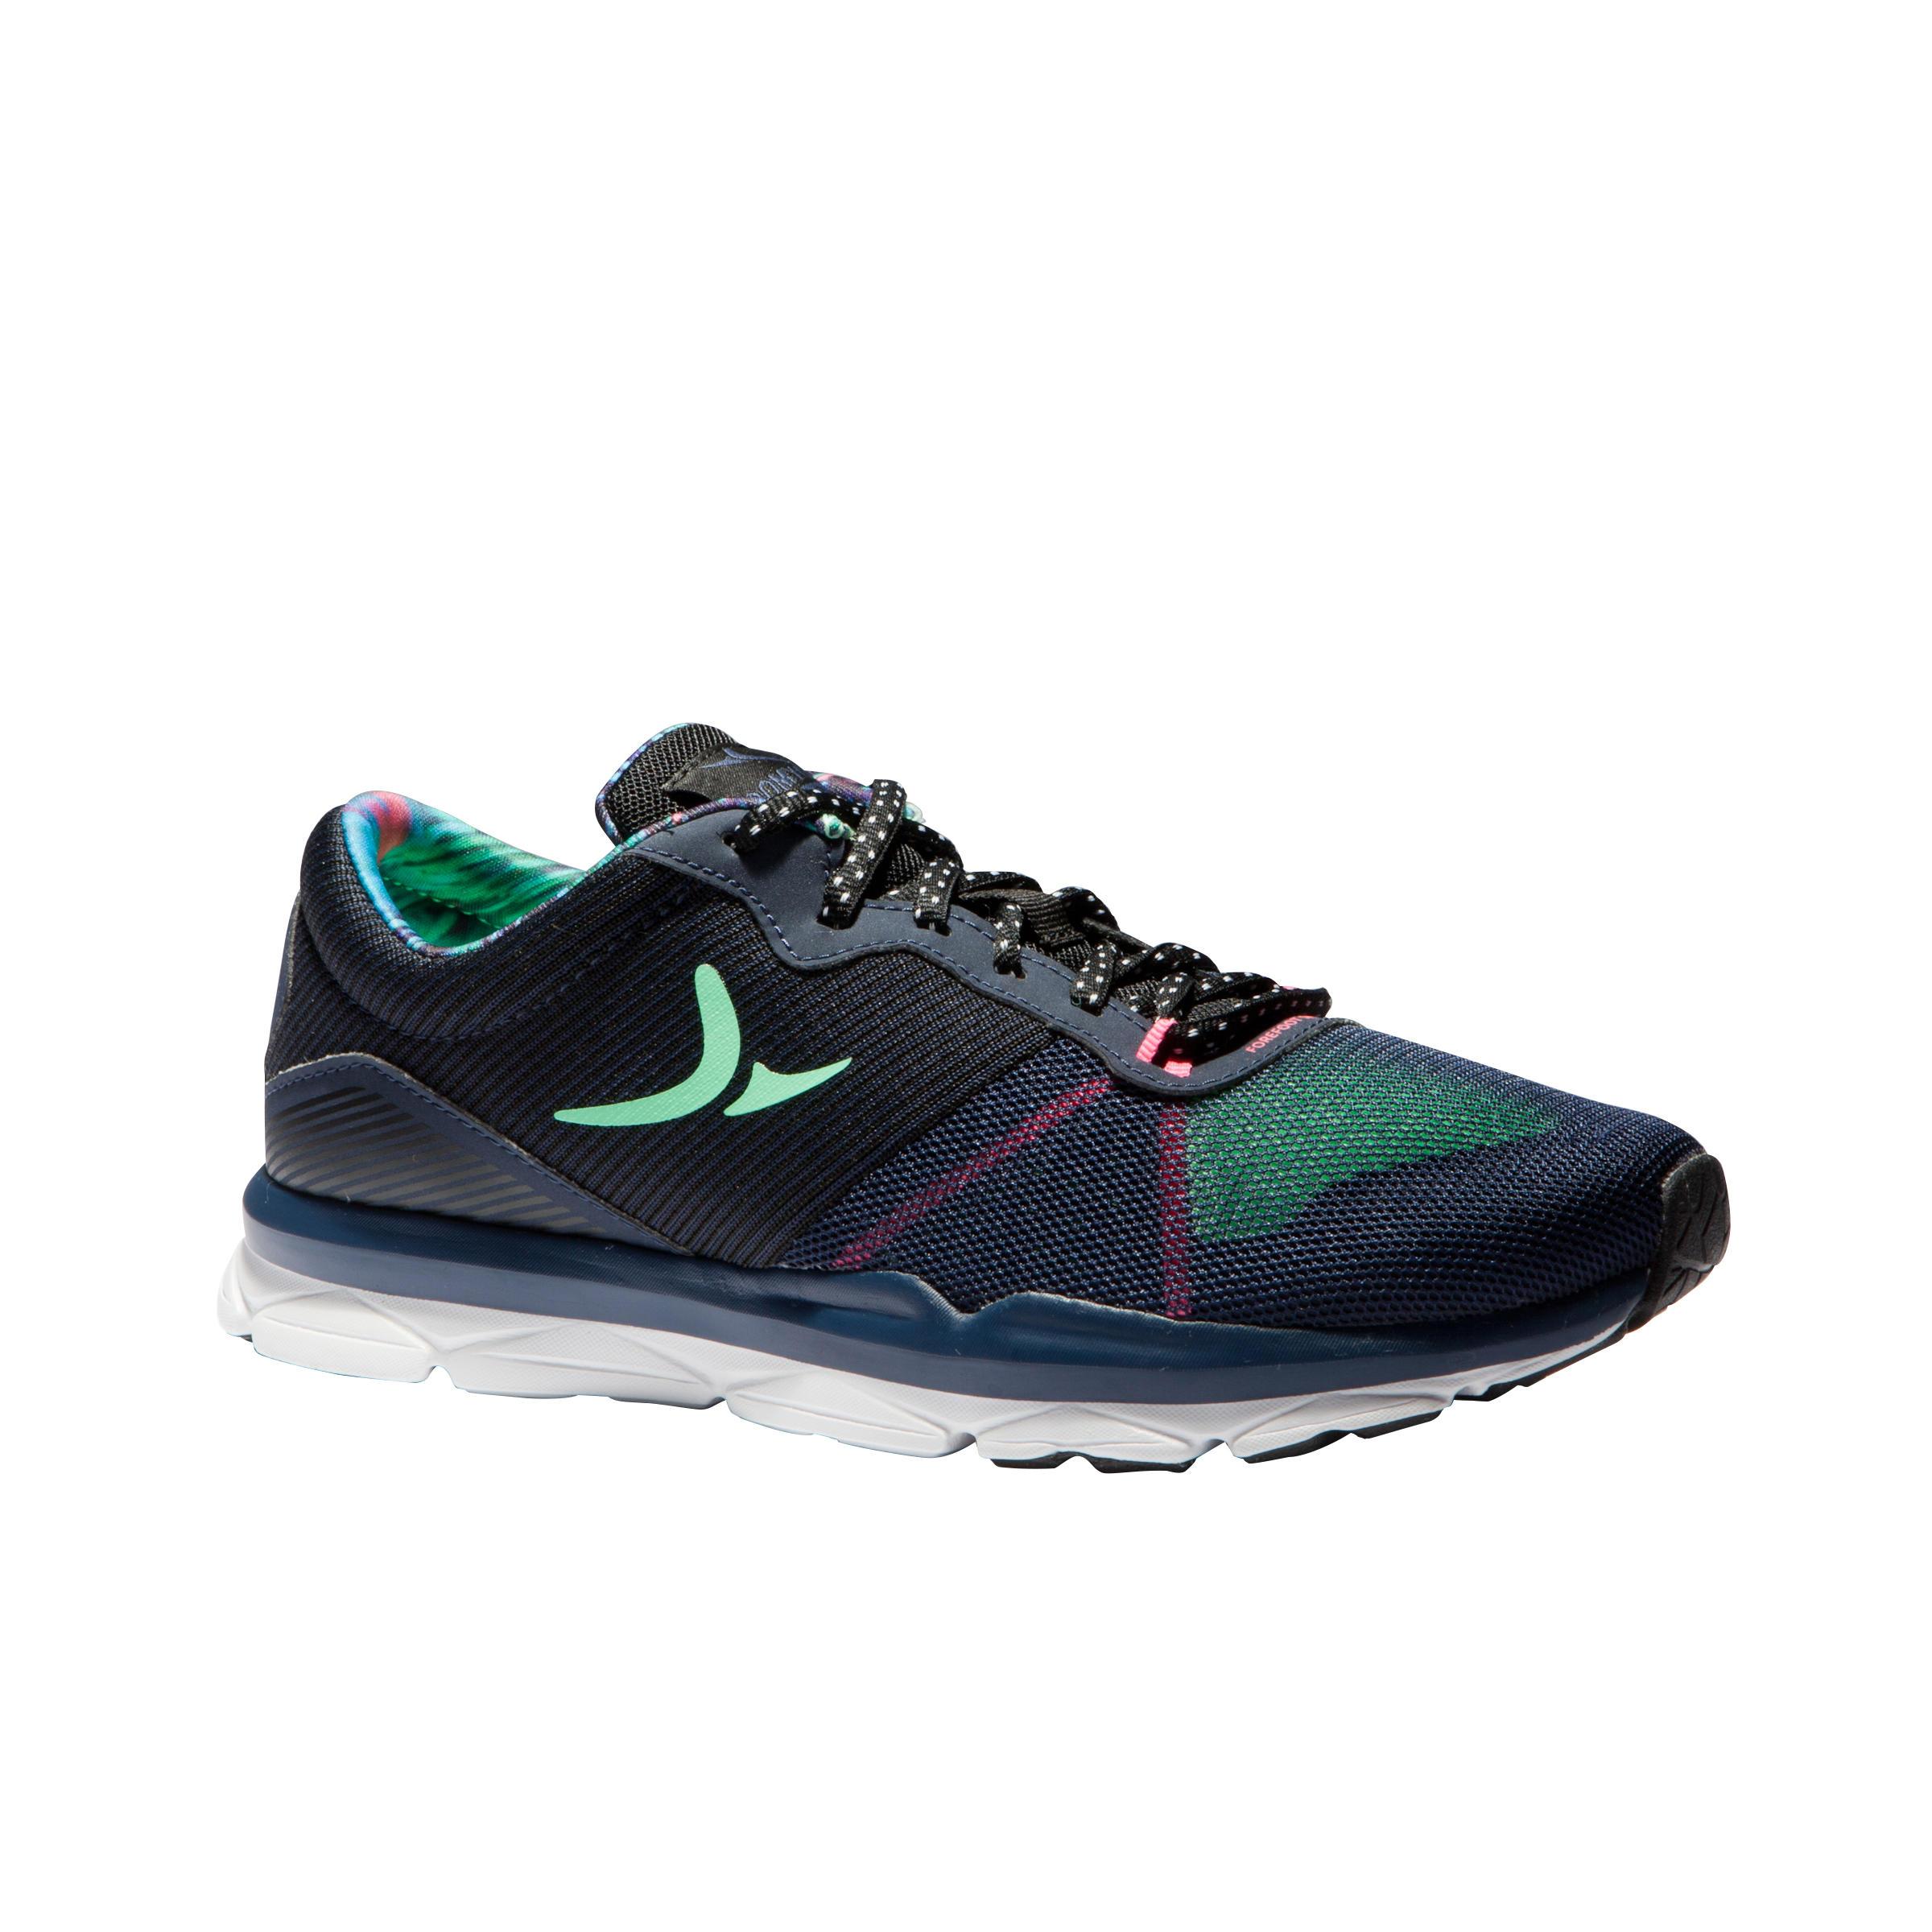 Chaussures entraînement cardio 500 femme bleu et vert Domyos